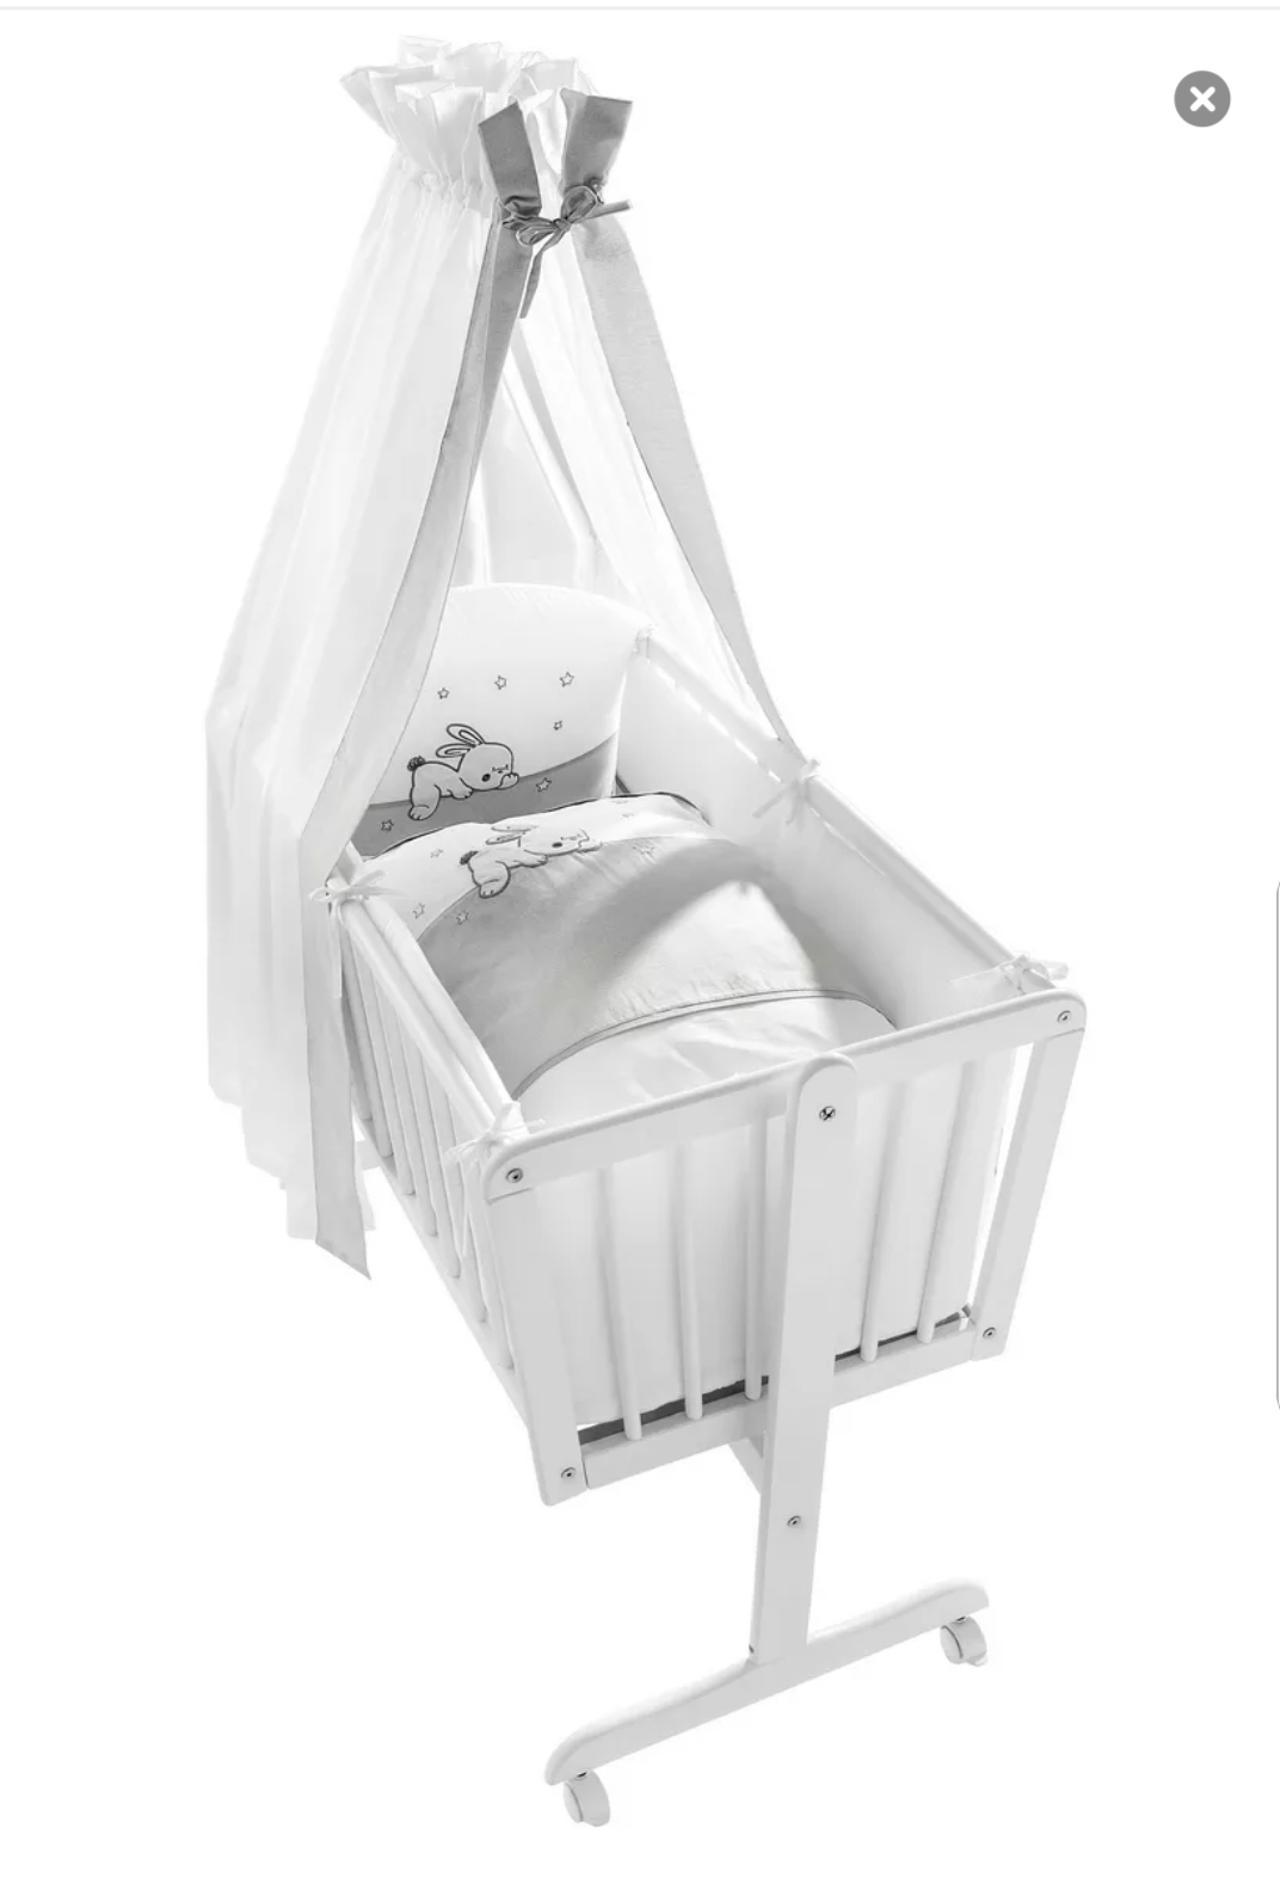 Baby In Wiege Schlafen Lassen Forum Baby Vorbereitung Urbia De